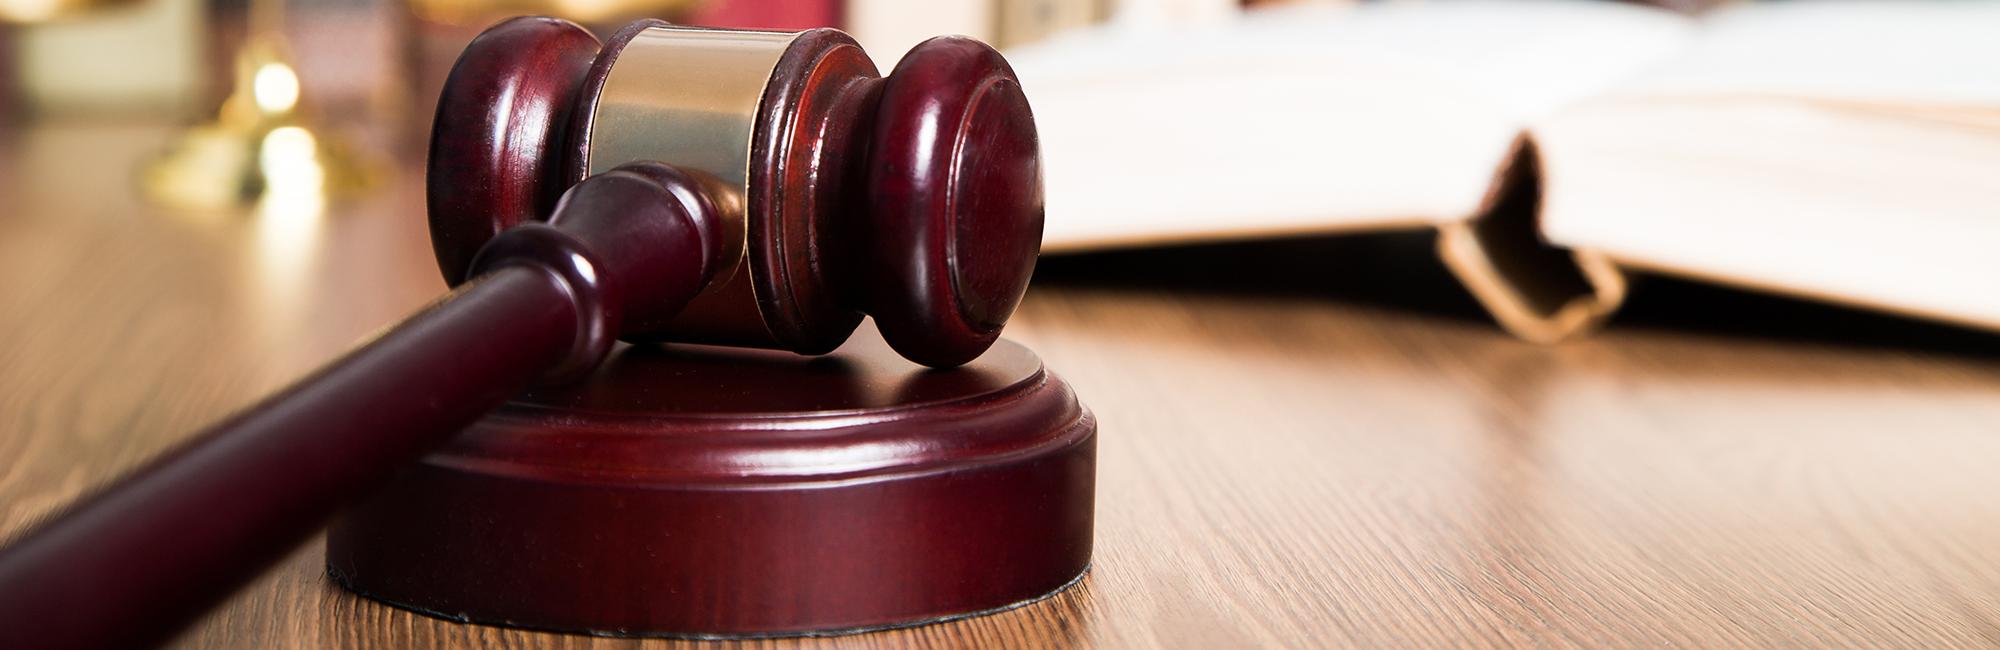 Child Support | Johnson County, KS | Divorce Attorney